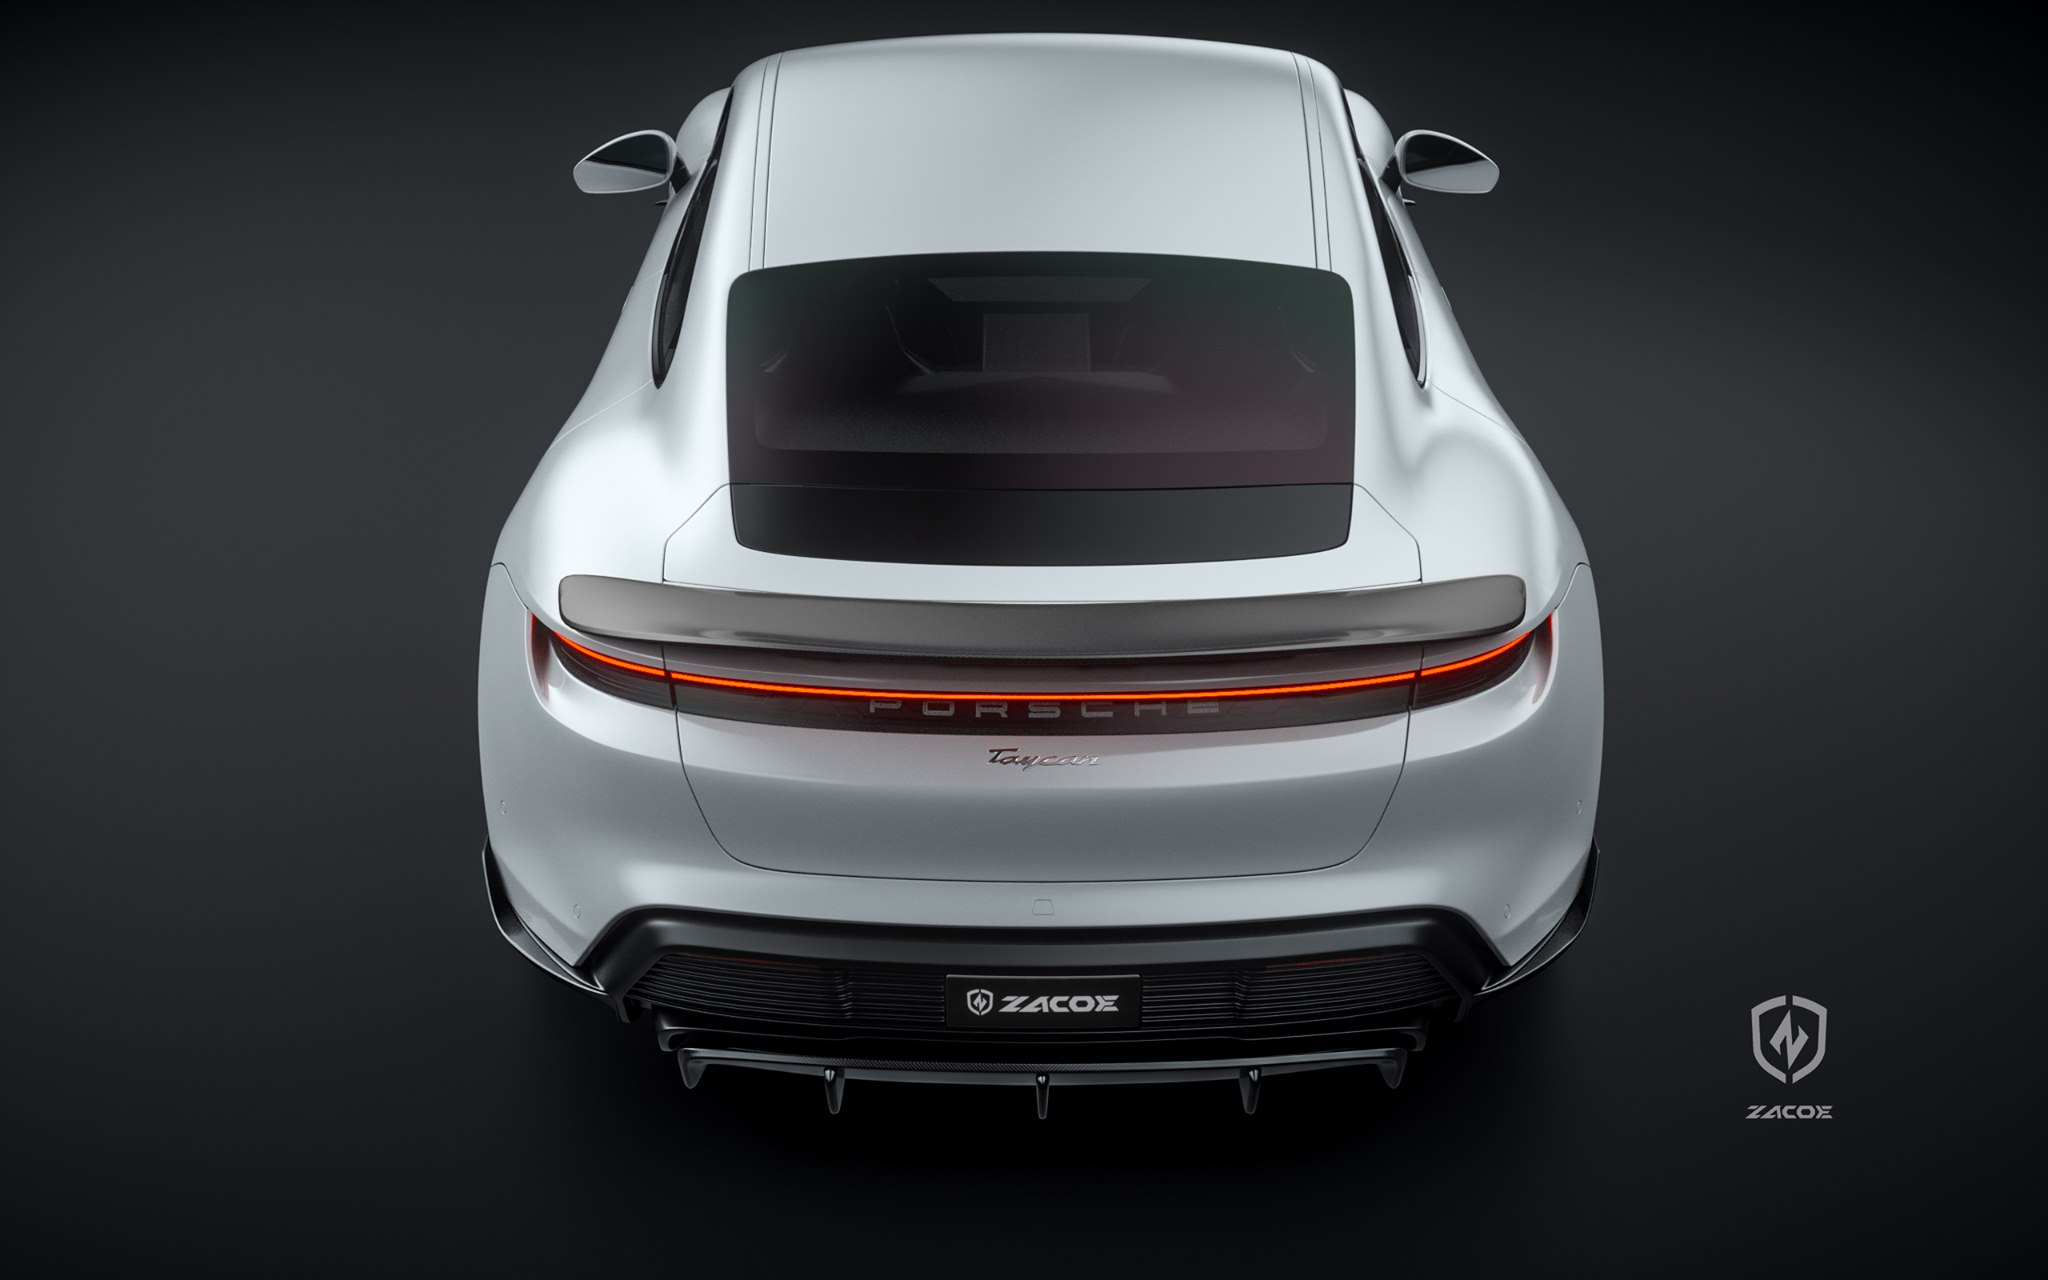 Porsche-Taycan-by-Zacoe-5